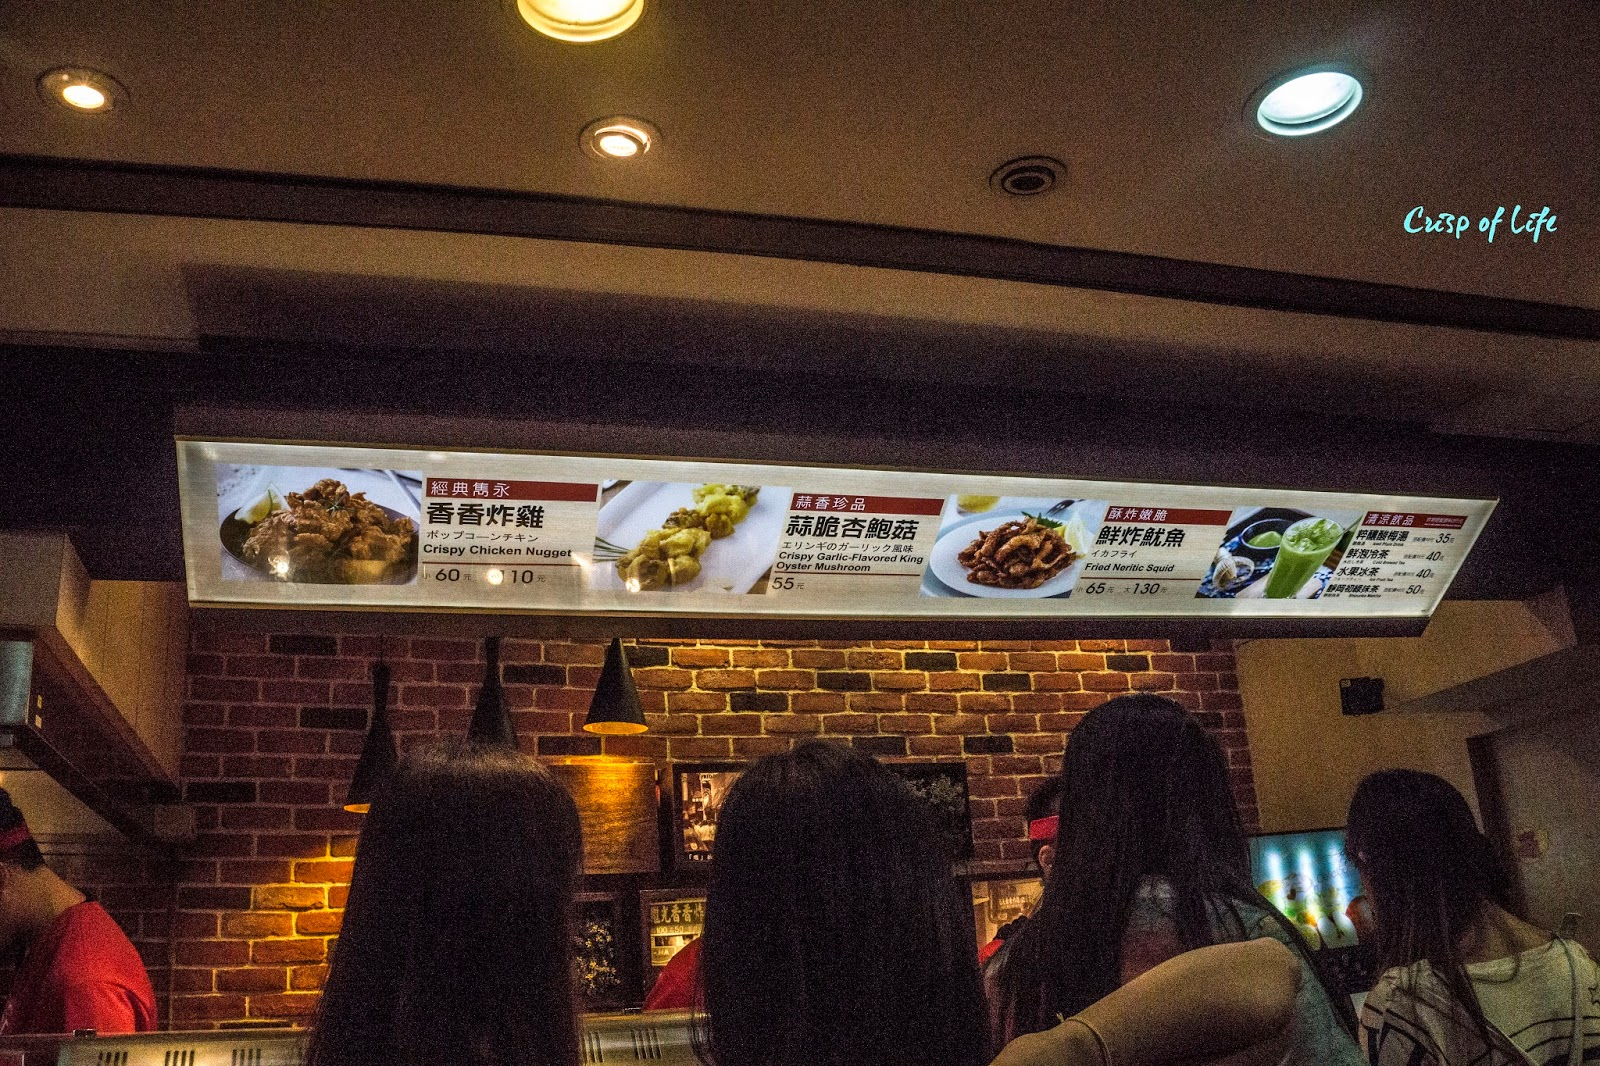 [TAIPEI 台北] Day 7:Shop and eat at Ximending 第七天:西门町逛街和美食